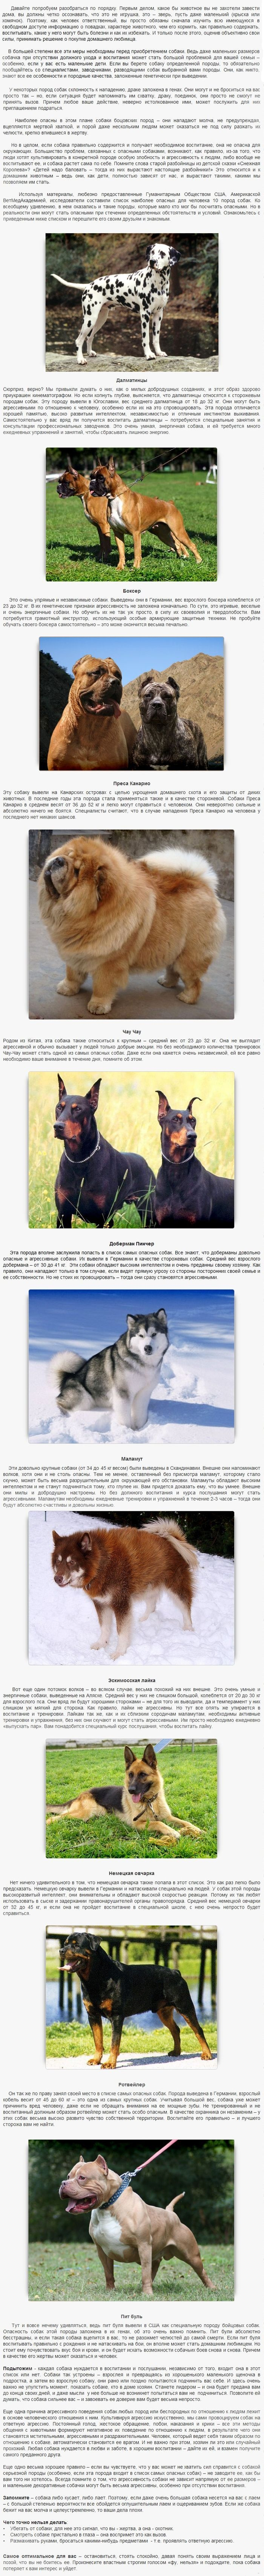 Dangerios_dogs_02